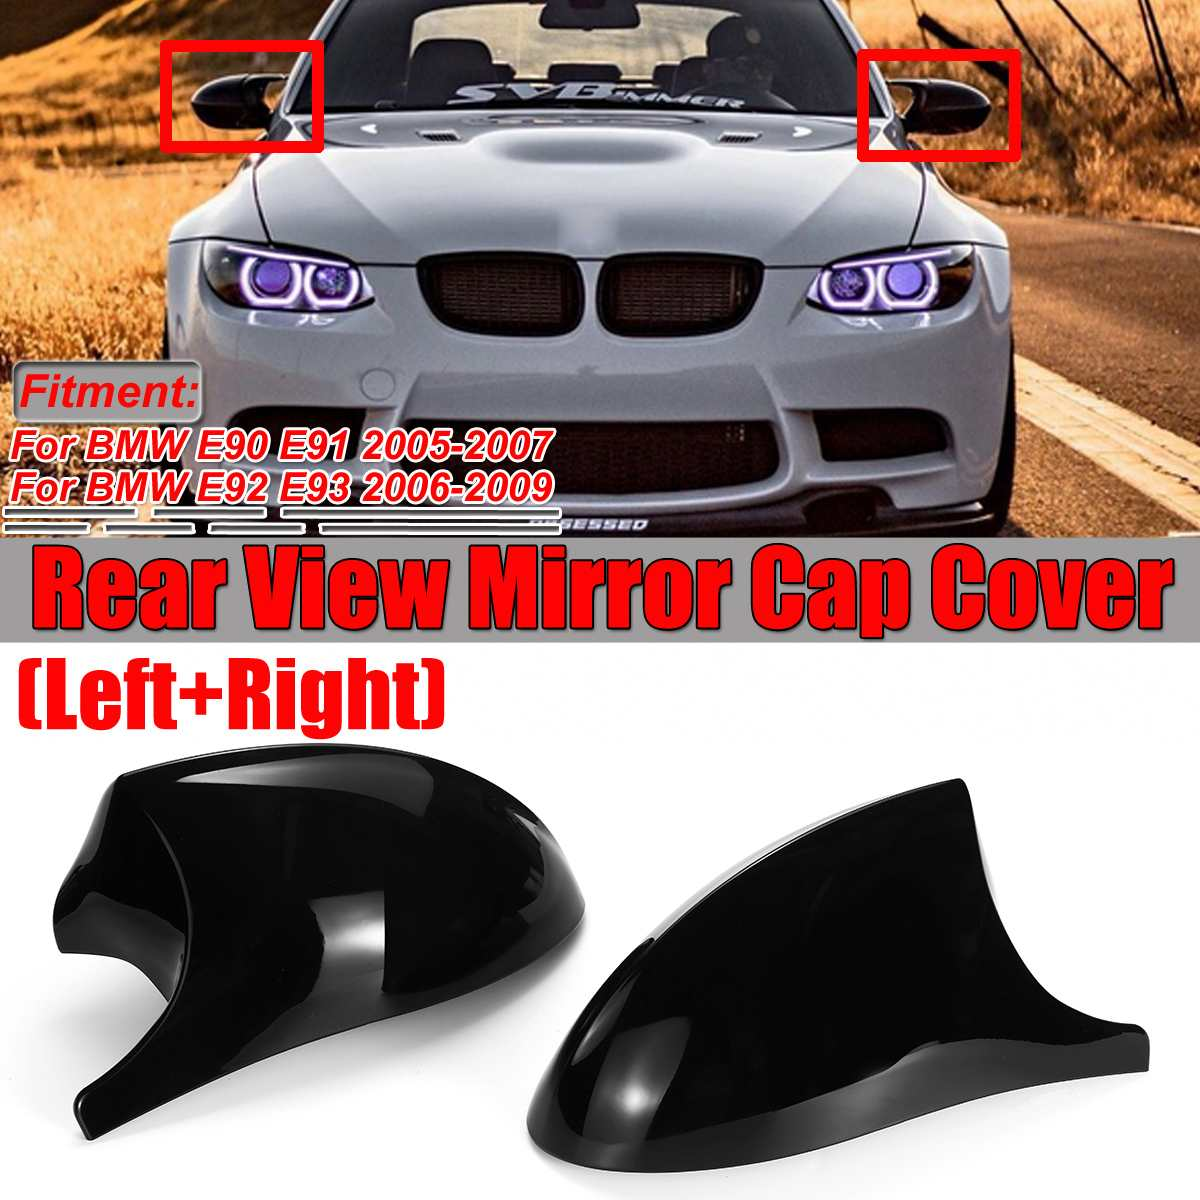 Passenger Side Left Wing Mirror Cover Cap For BMW E90 E91 3-Series 2006-2008